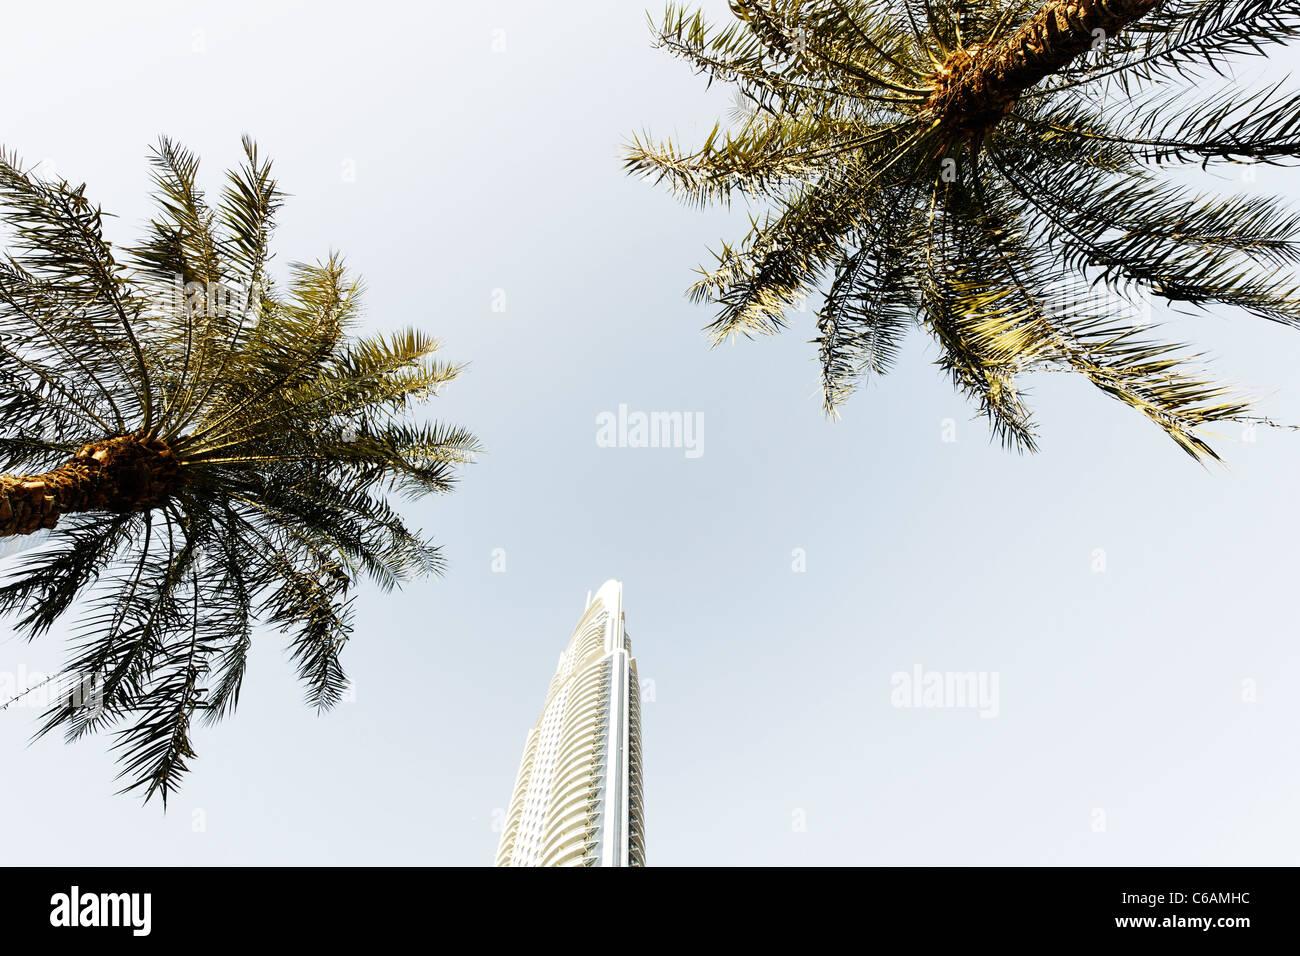 Burj Khalifa, the tallest building in the world, 828m high, Downtown Dubai, Dubai, United Arab Emirates, Middle - Stock Image